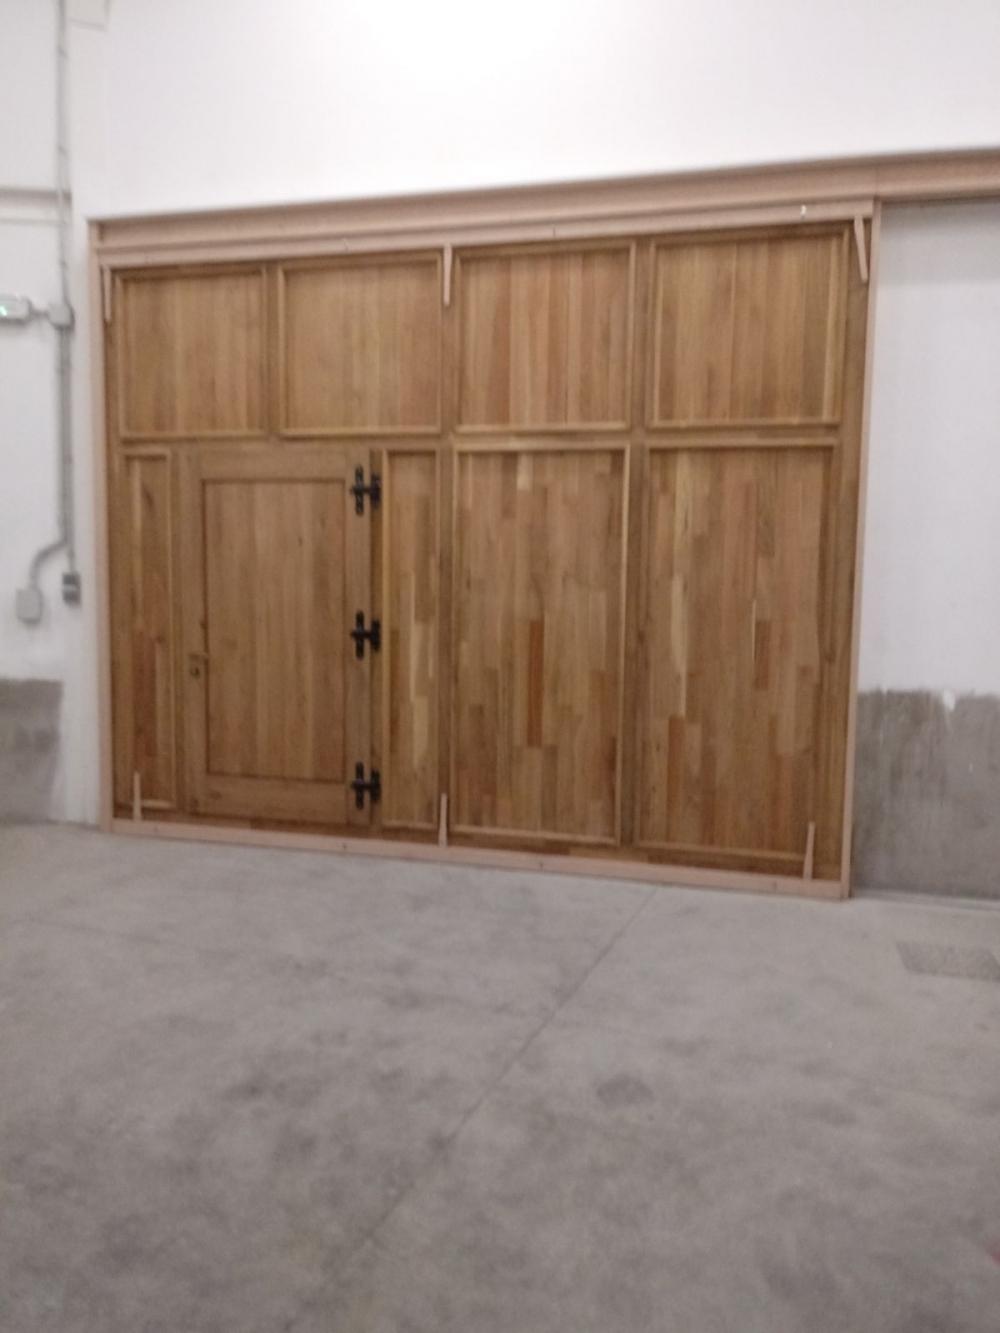 Carpinter A Las Palmas Carpinter A De Madera En Gran Canarias  # Muebles Vecindario Gran Canaria